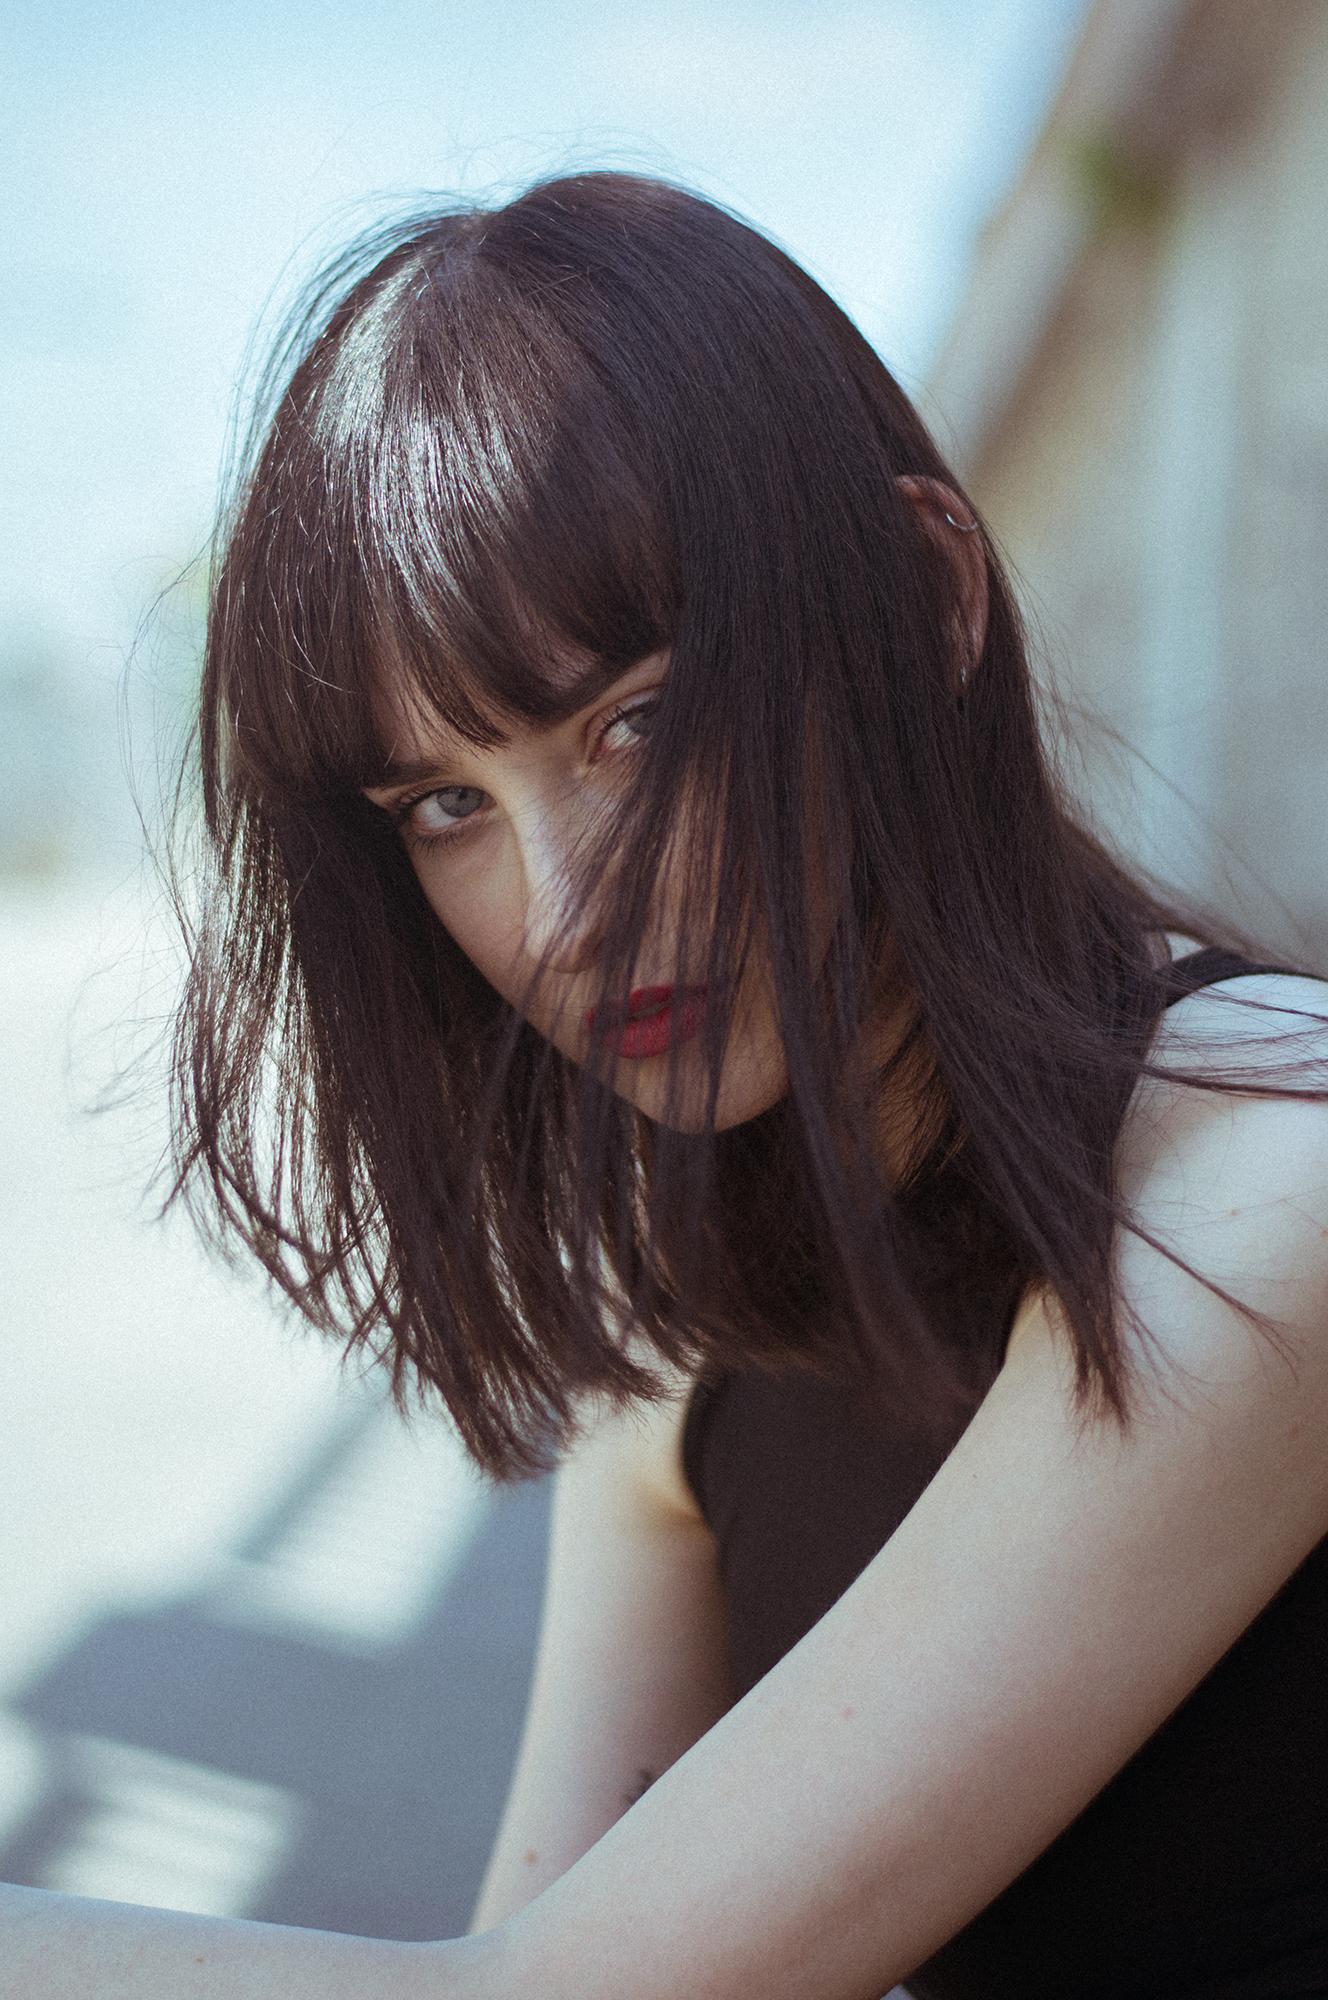 Mila-Nowhere-Andrea-Passon-4